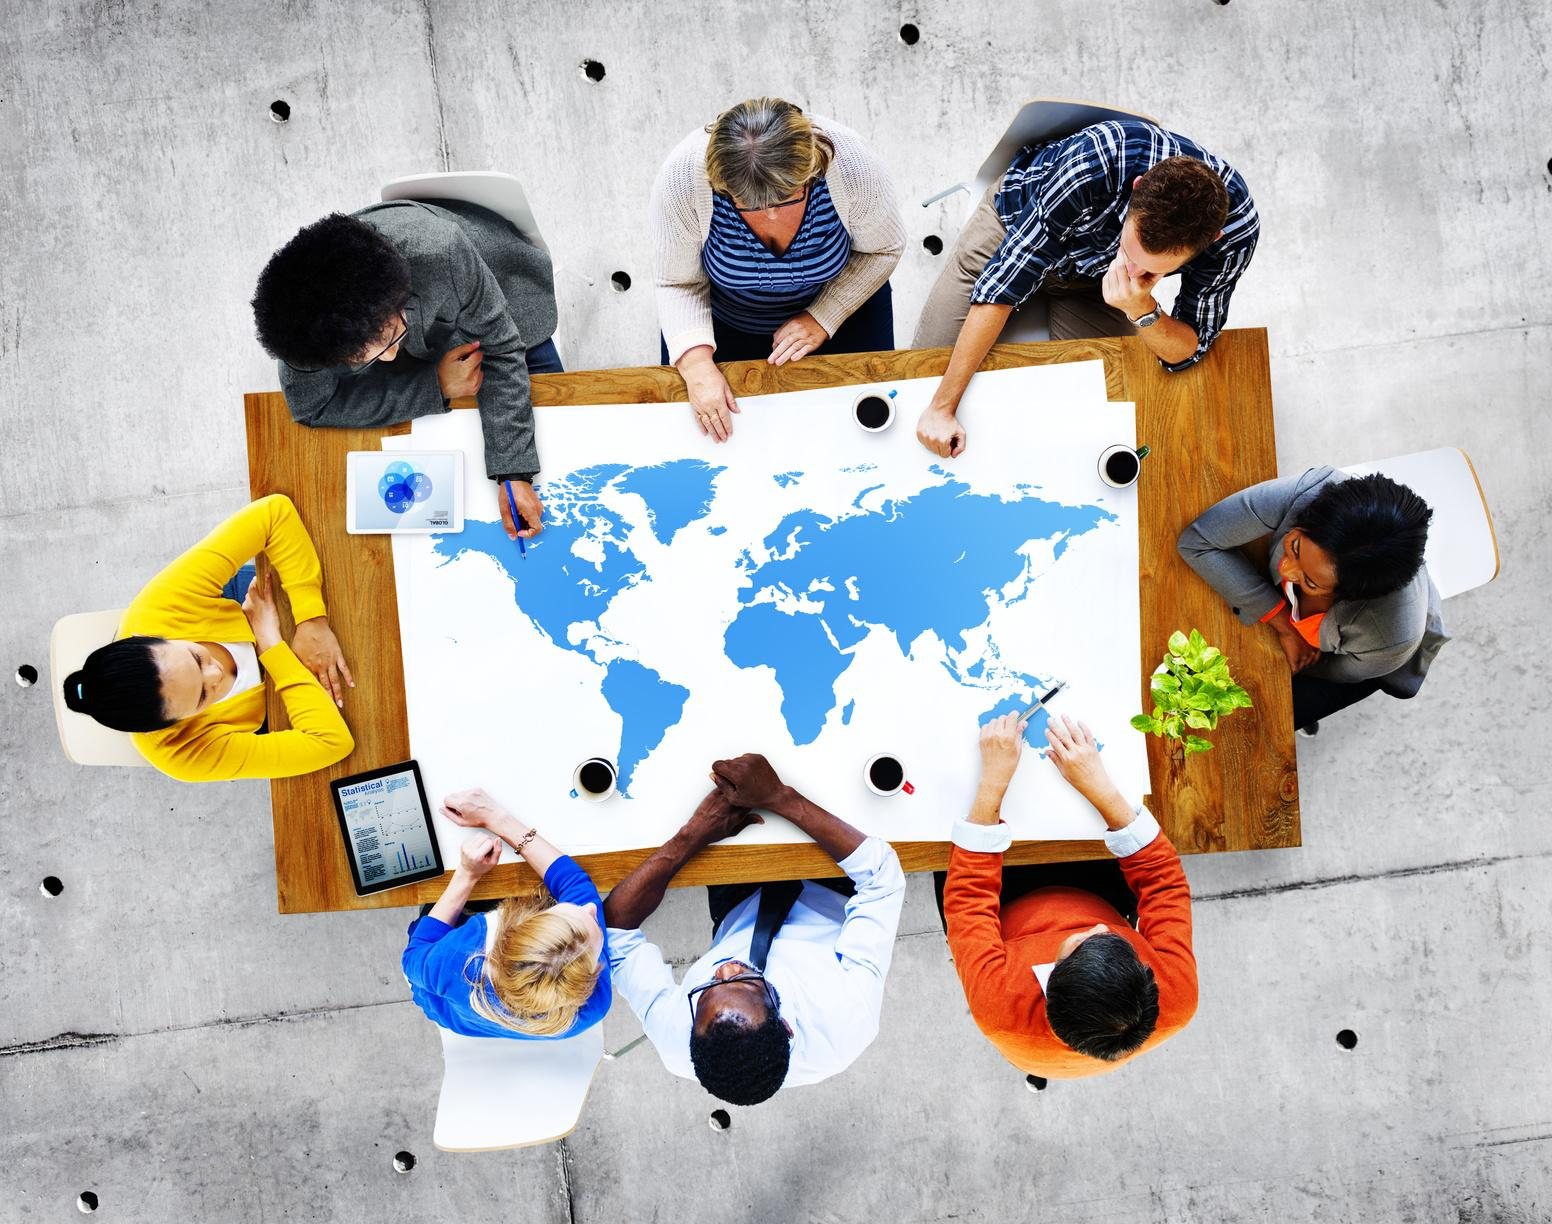 5 Essential Skills Every International Business Person